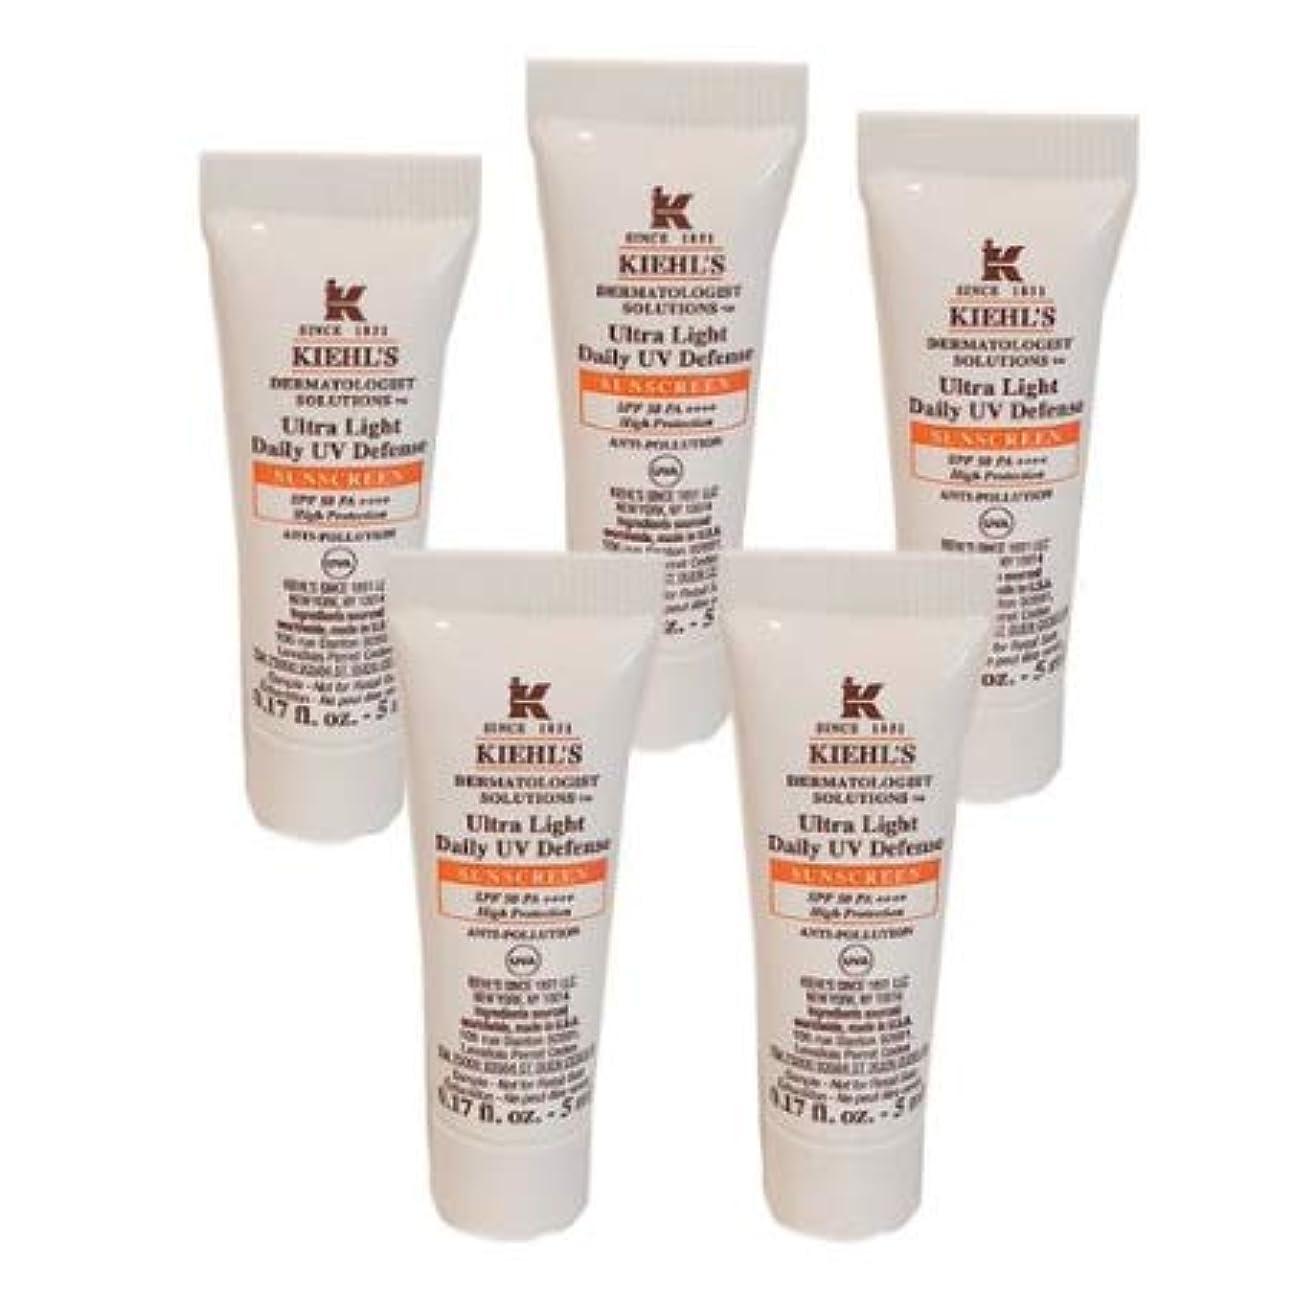 Kiehl's(キールズ) キールズ UVディフェンス (5ml x 5個) / KIEHL'S Ultra Light Daily UV Defense Sunscreen SPF 50 PA++++